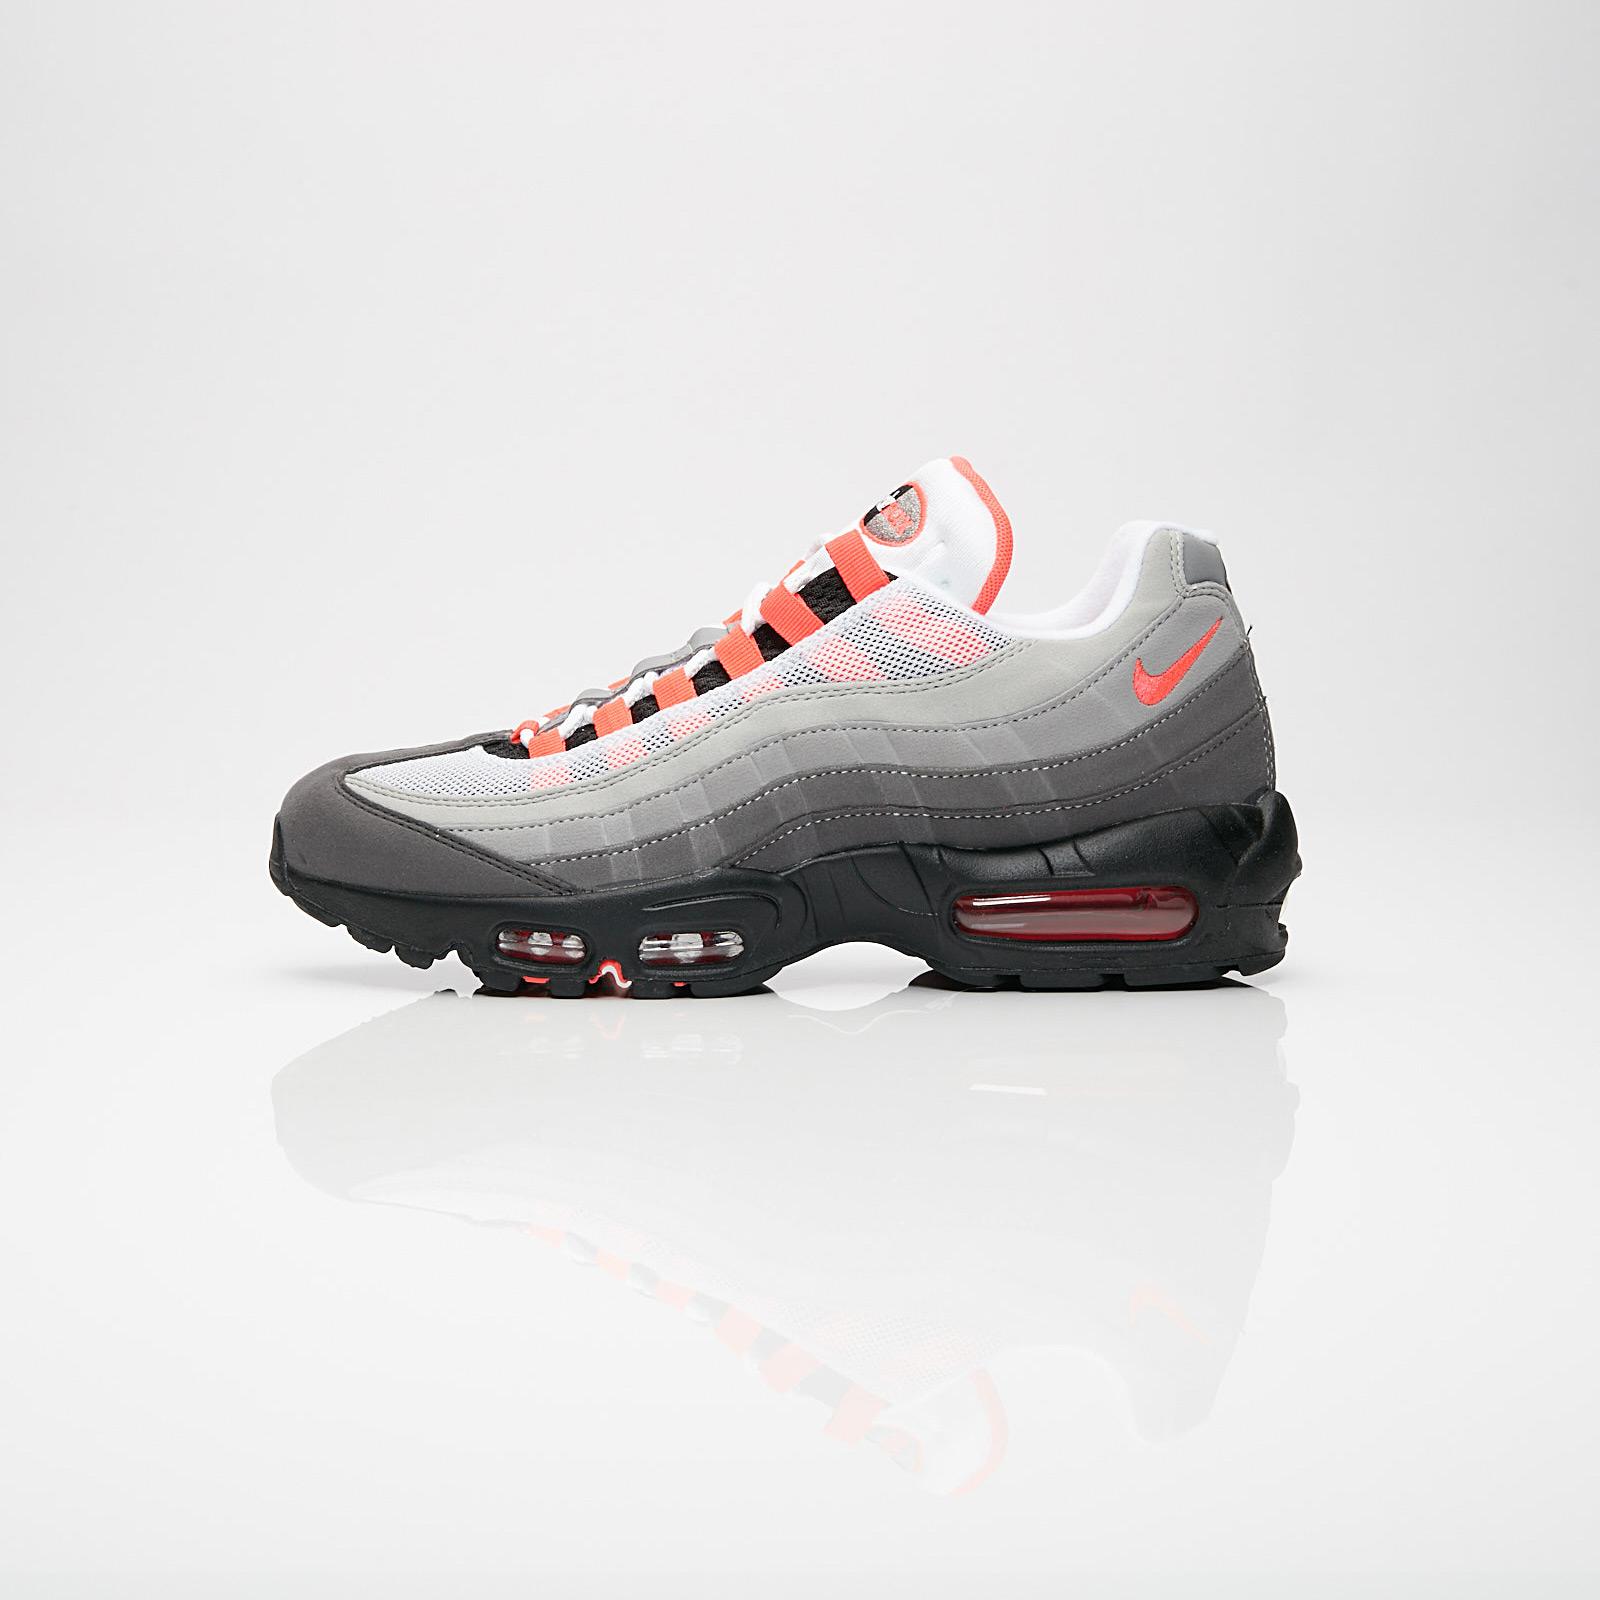 uk availability 24aa0 cfa90 Nike Air Max 95 OG - At2865-100 - Sneakersnstuff   sneakers   streetwear på  nätet sen 1999